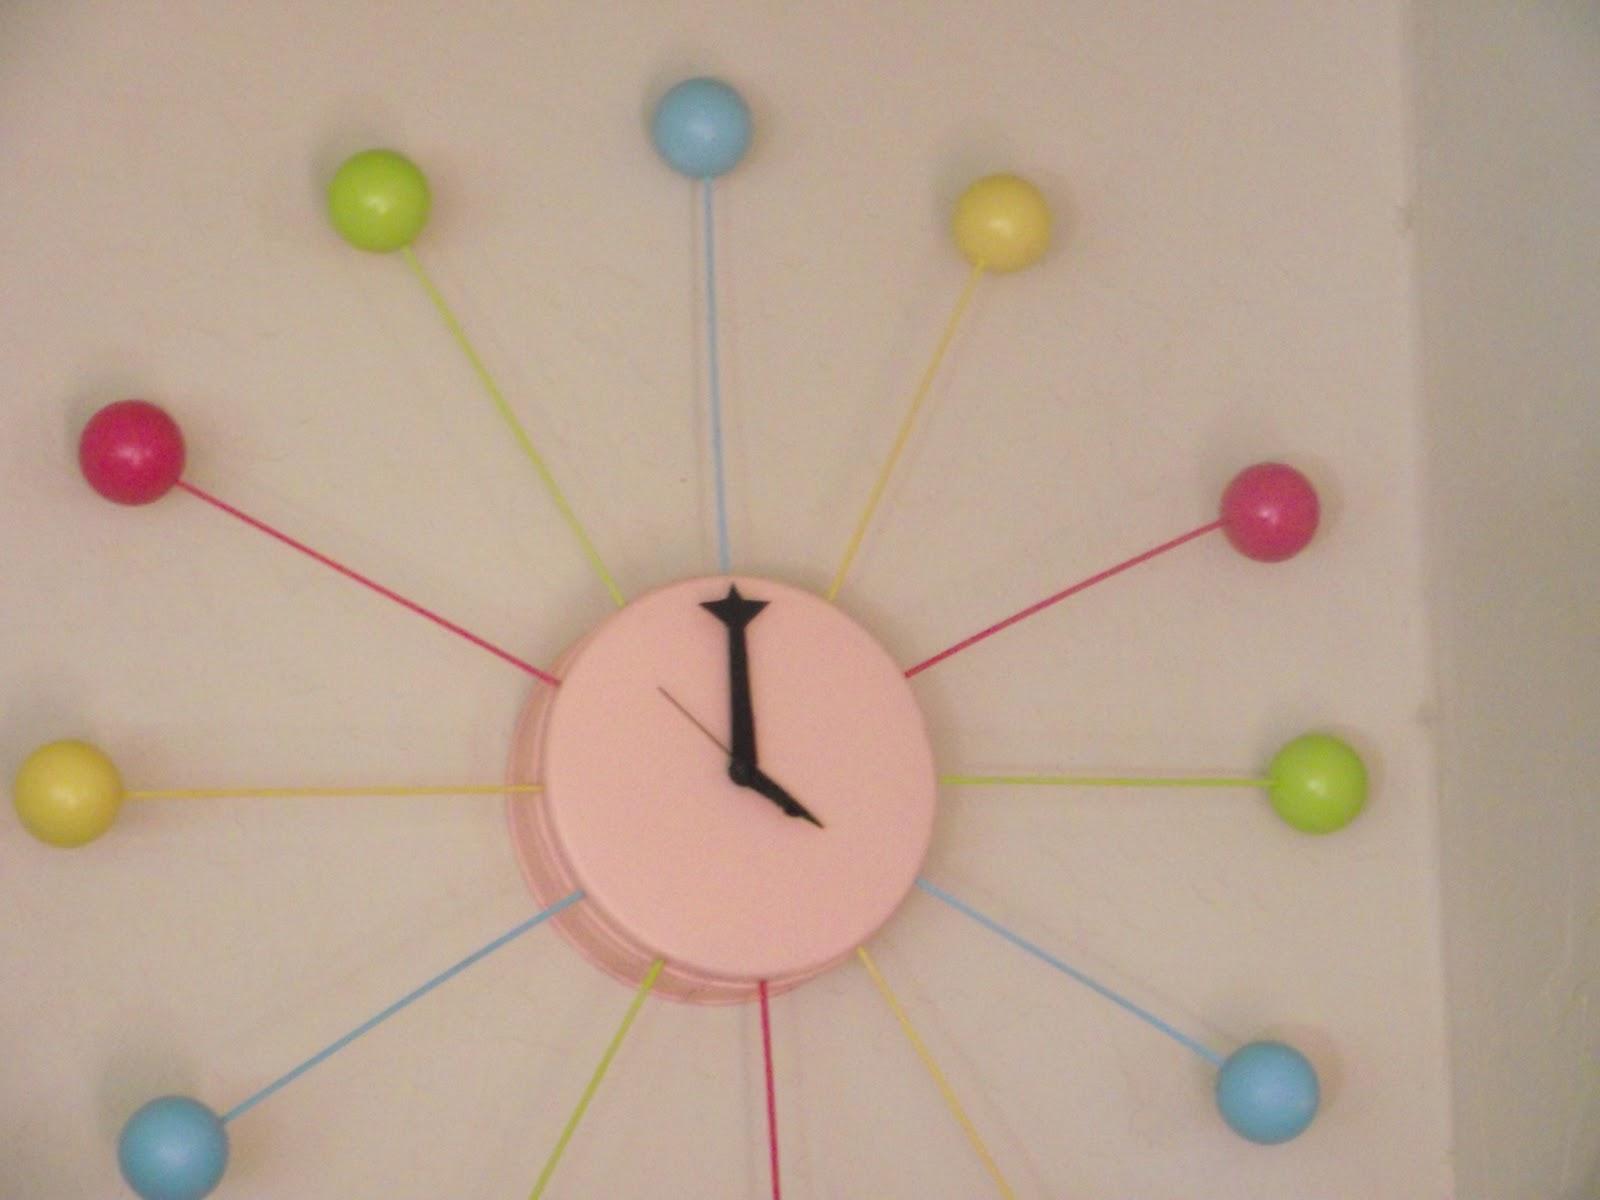 3 Ways to Set SkyScan Atomic Clock - wikiHow